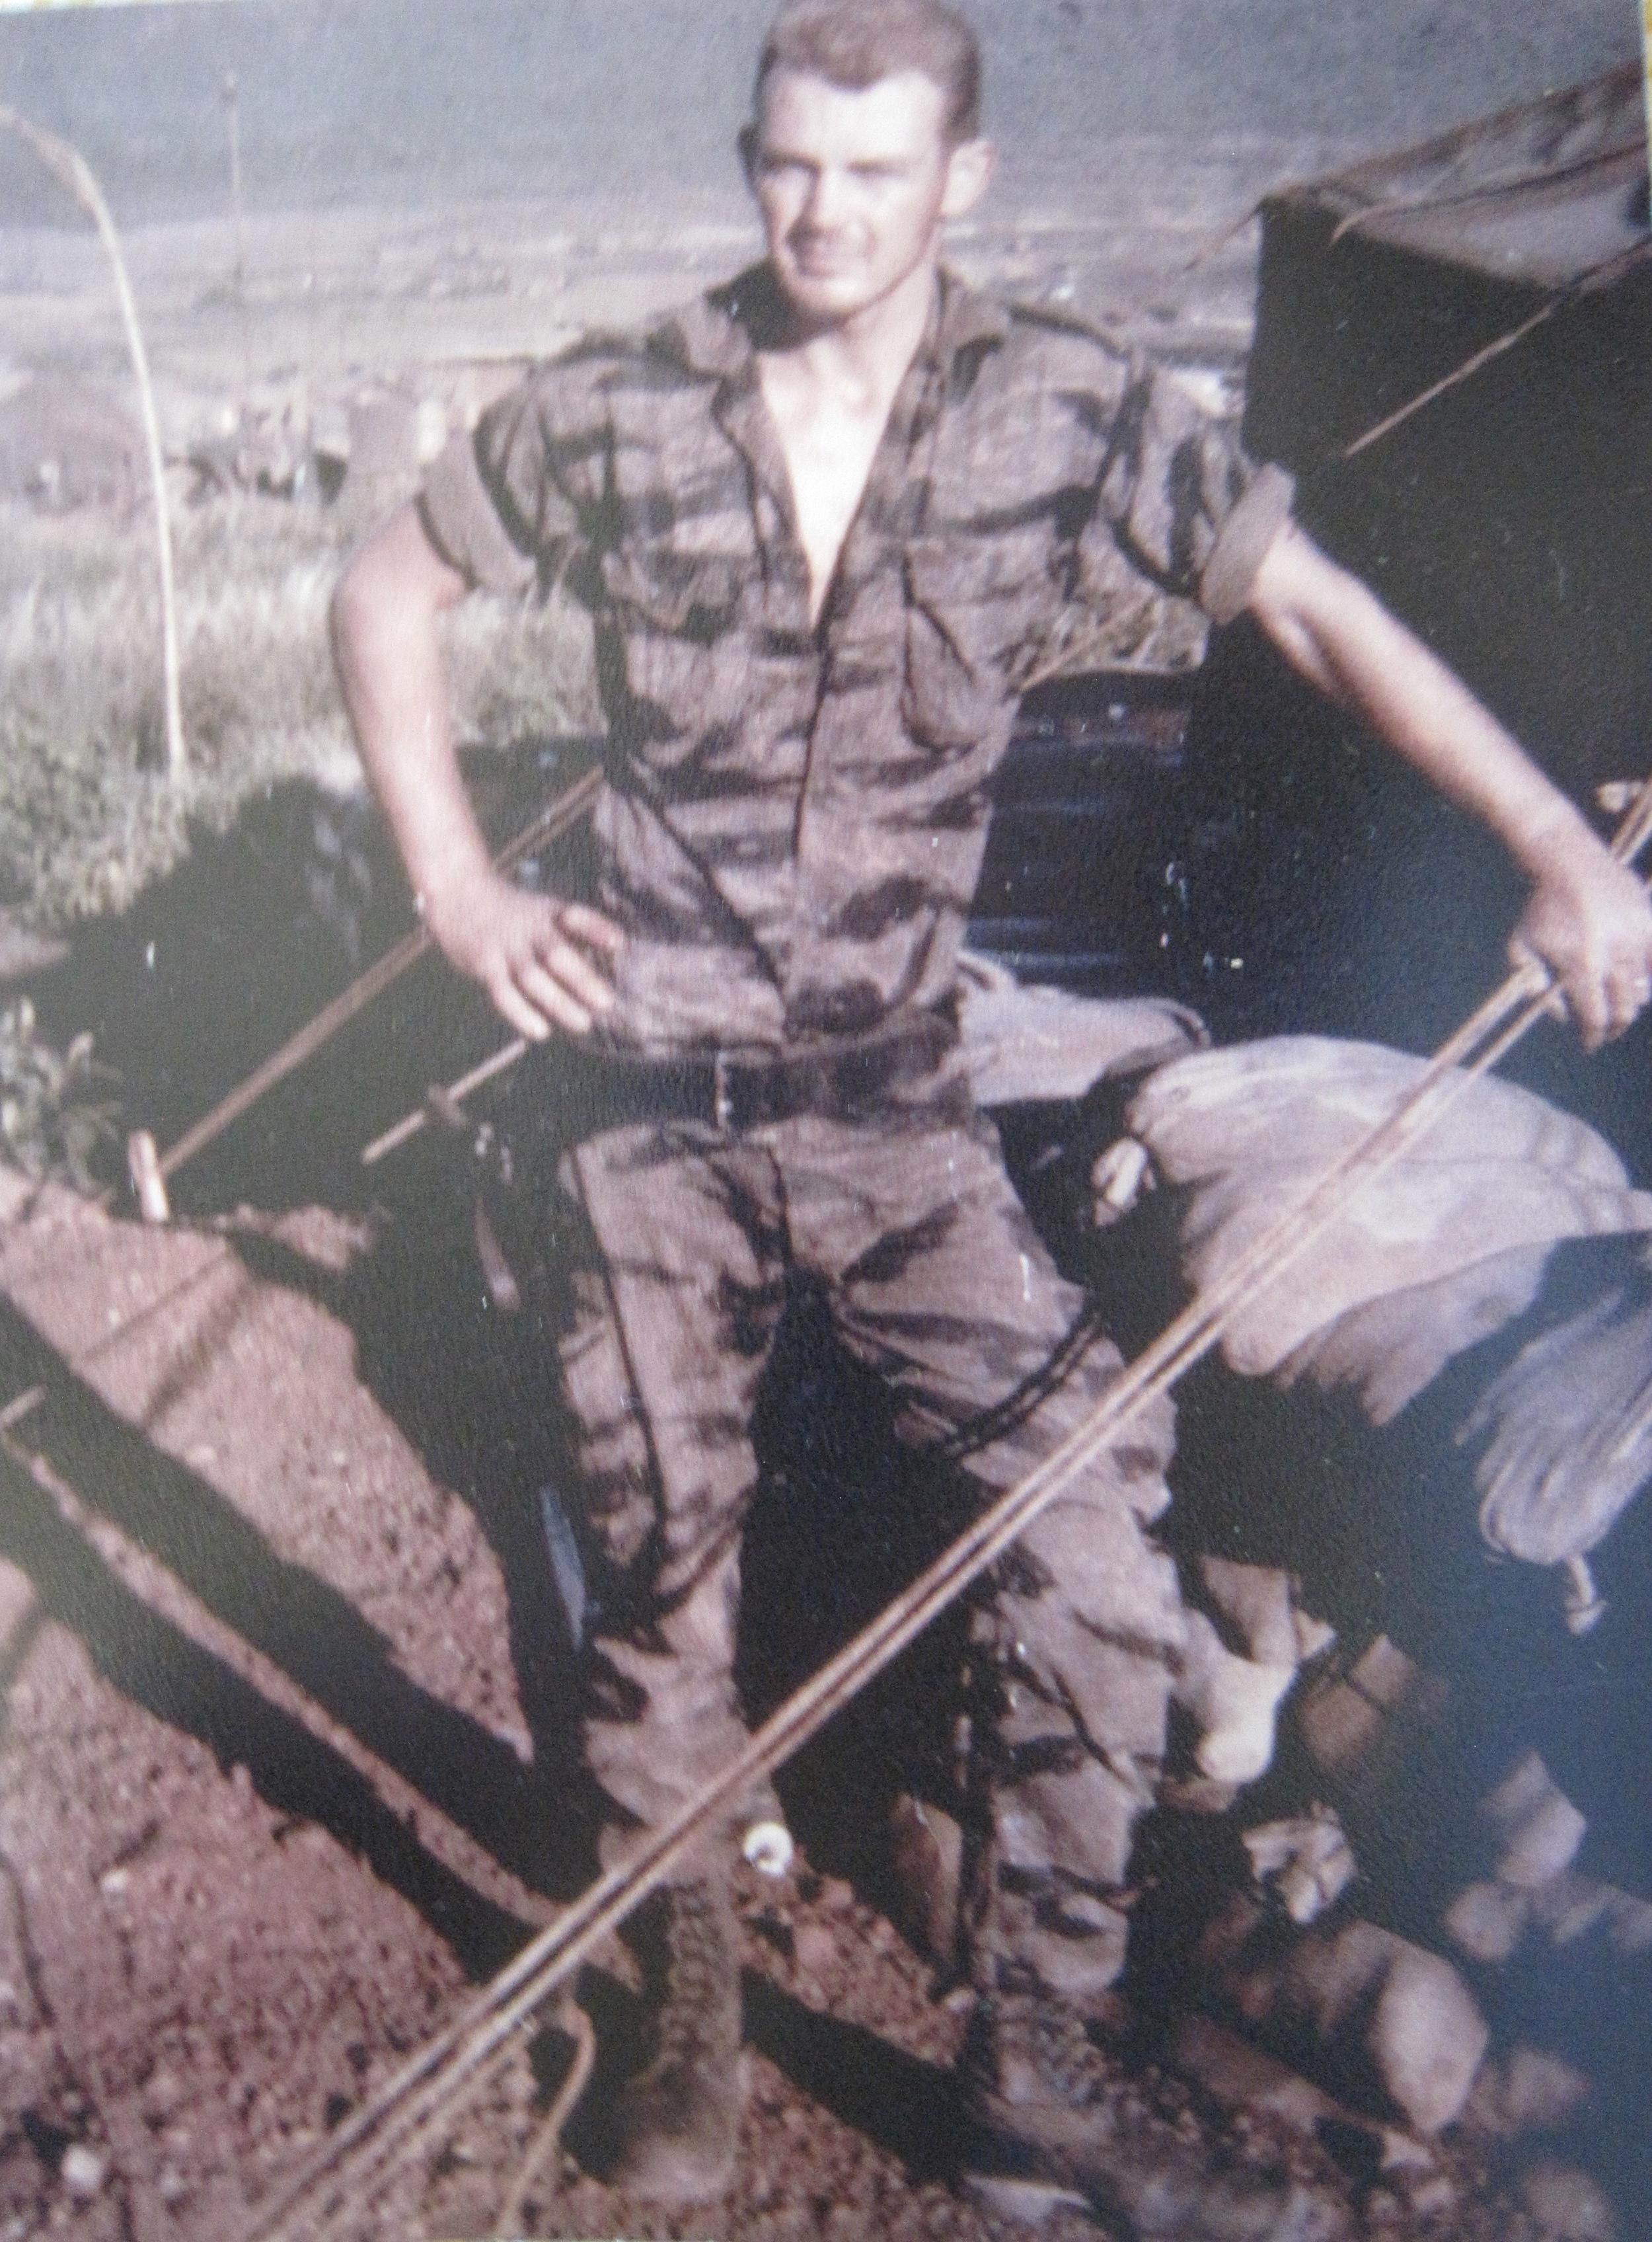 LZEnglish. My ATL, Burt Penkunis, aRecondo School grad and former line-infantryman